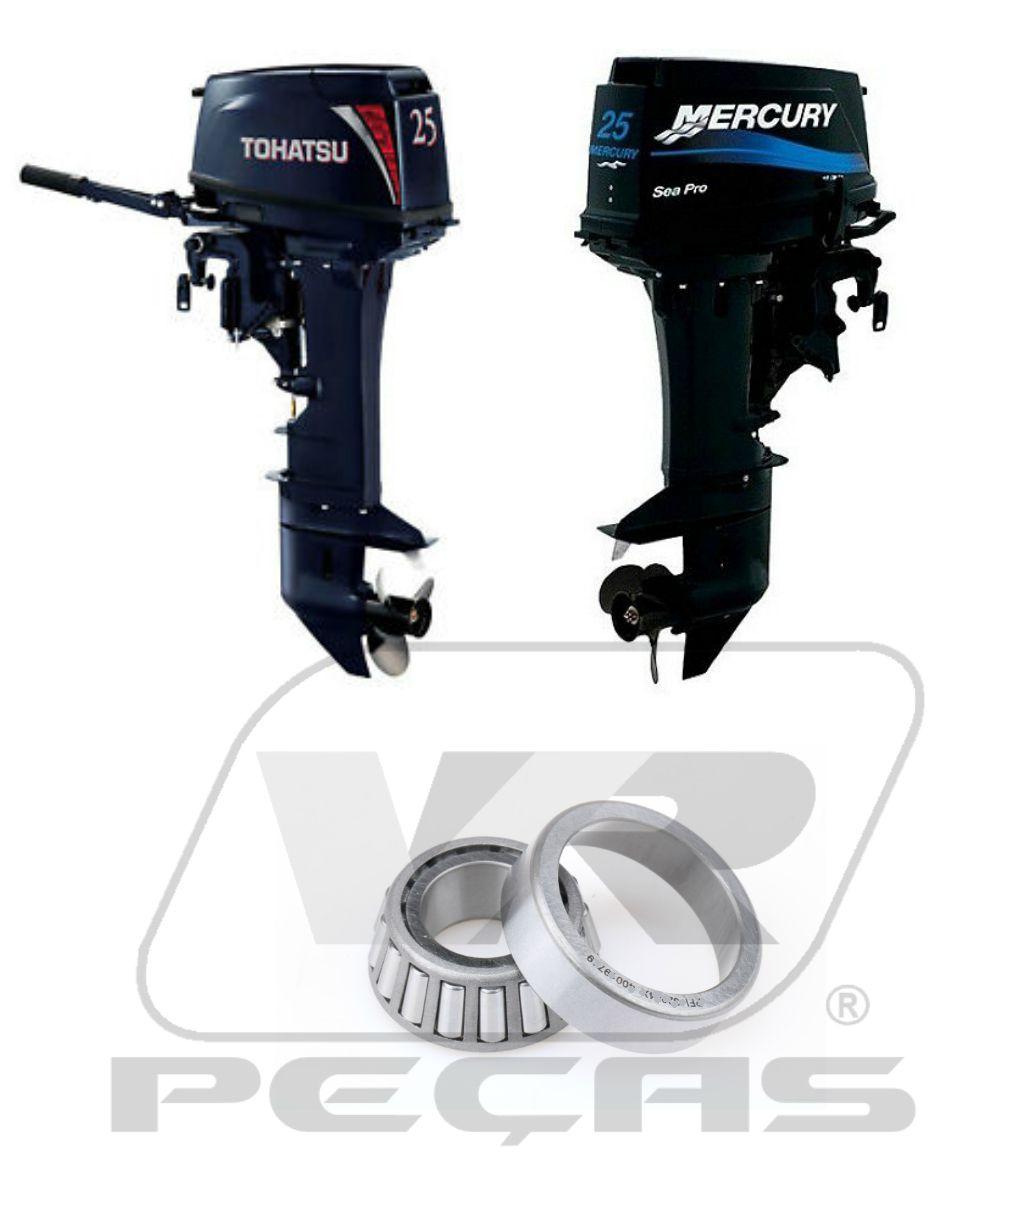 Rolamento Eixo Vertical Motores Mercury e Tohatsu 25HP/30HP